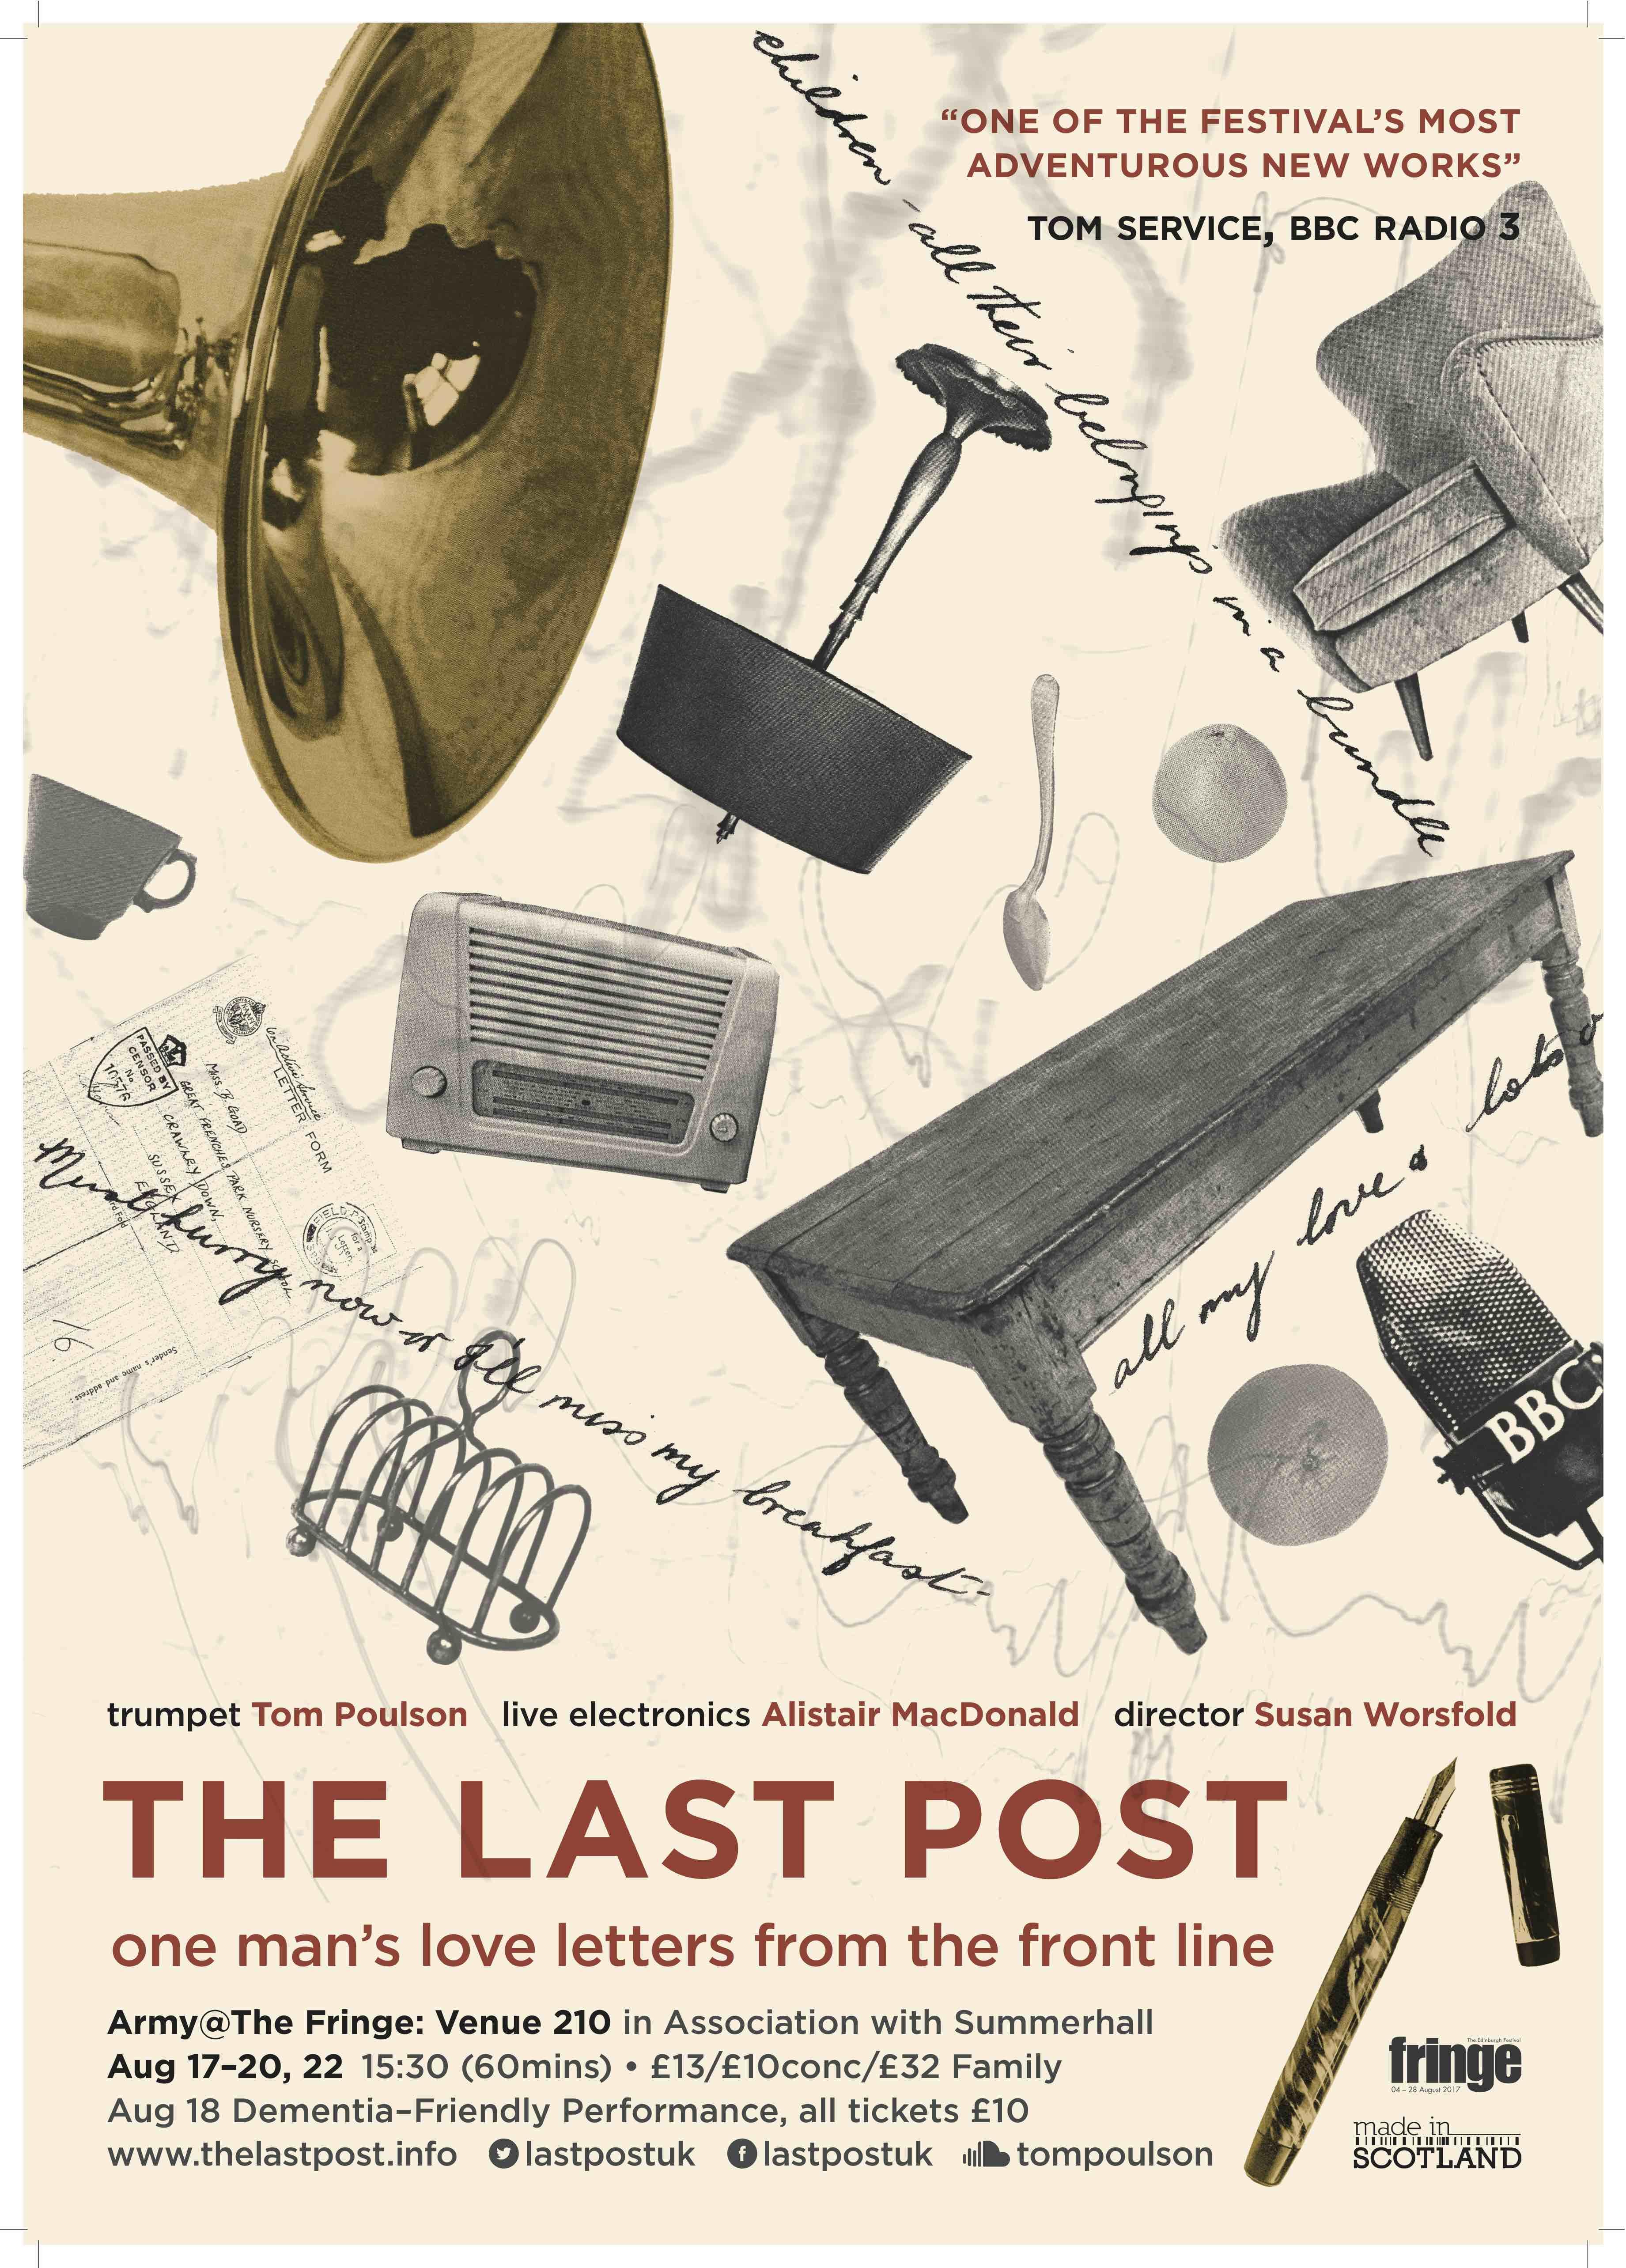 Last Post EdFringe Poster